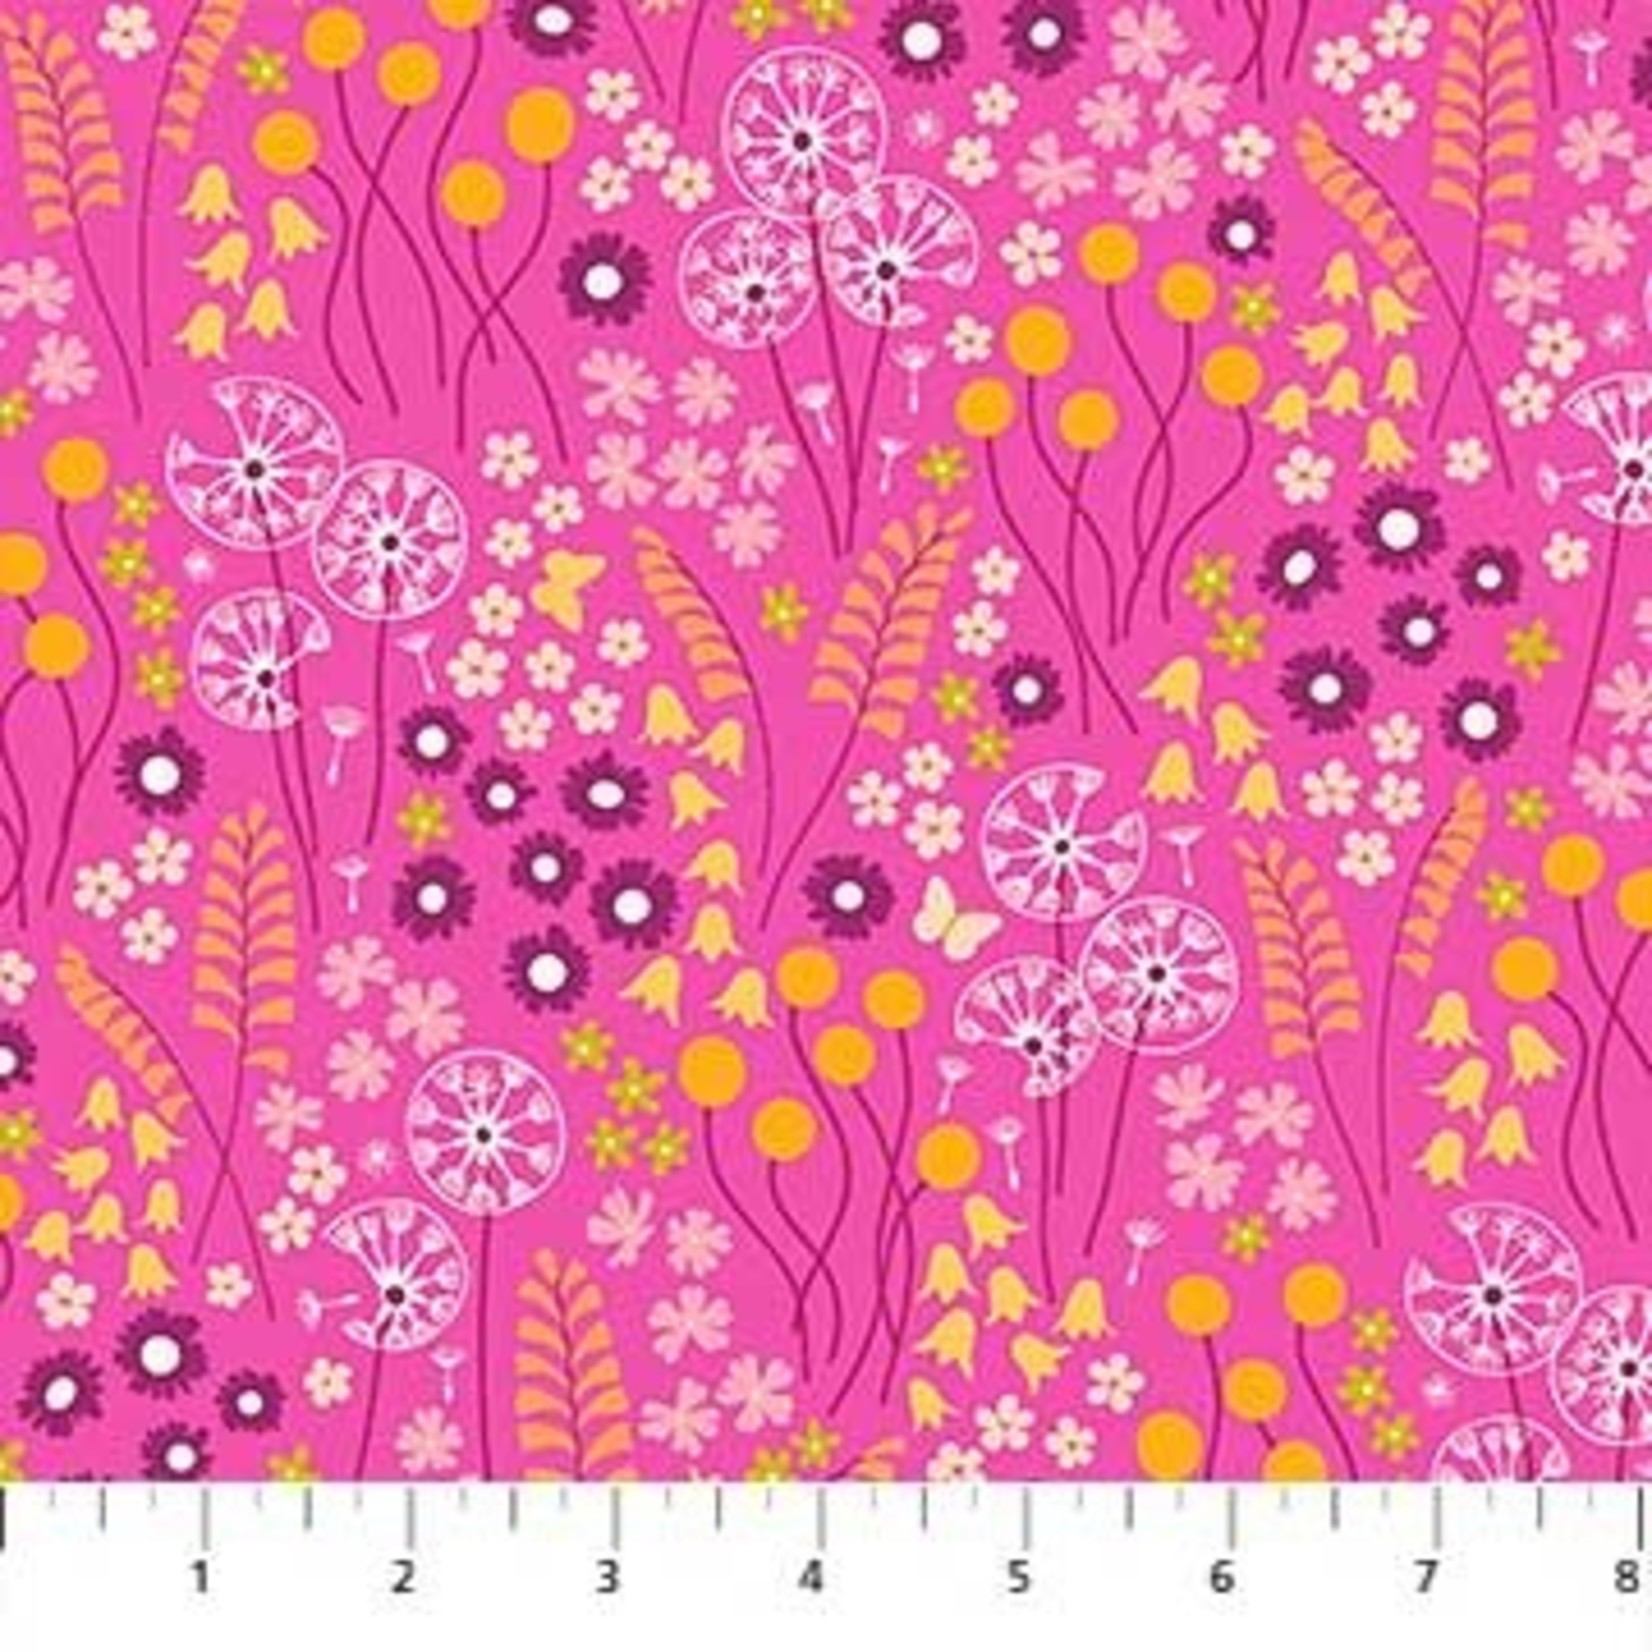 Figo Fabrics Mountain Meadow - Flower Fields - Pink